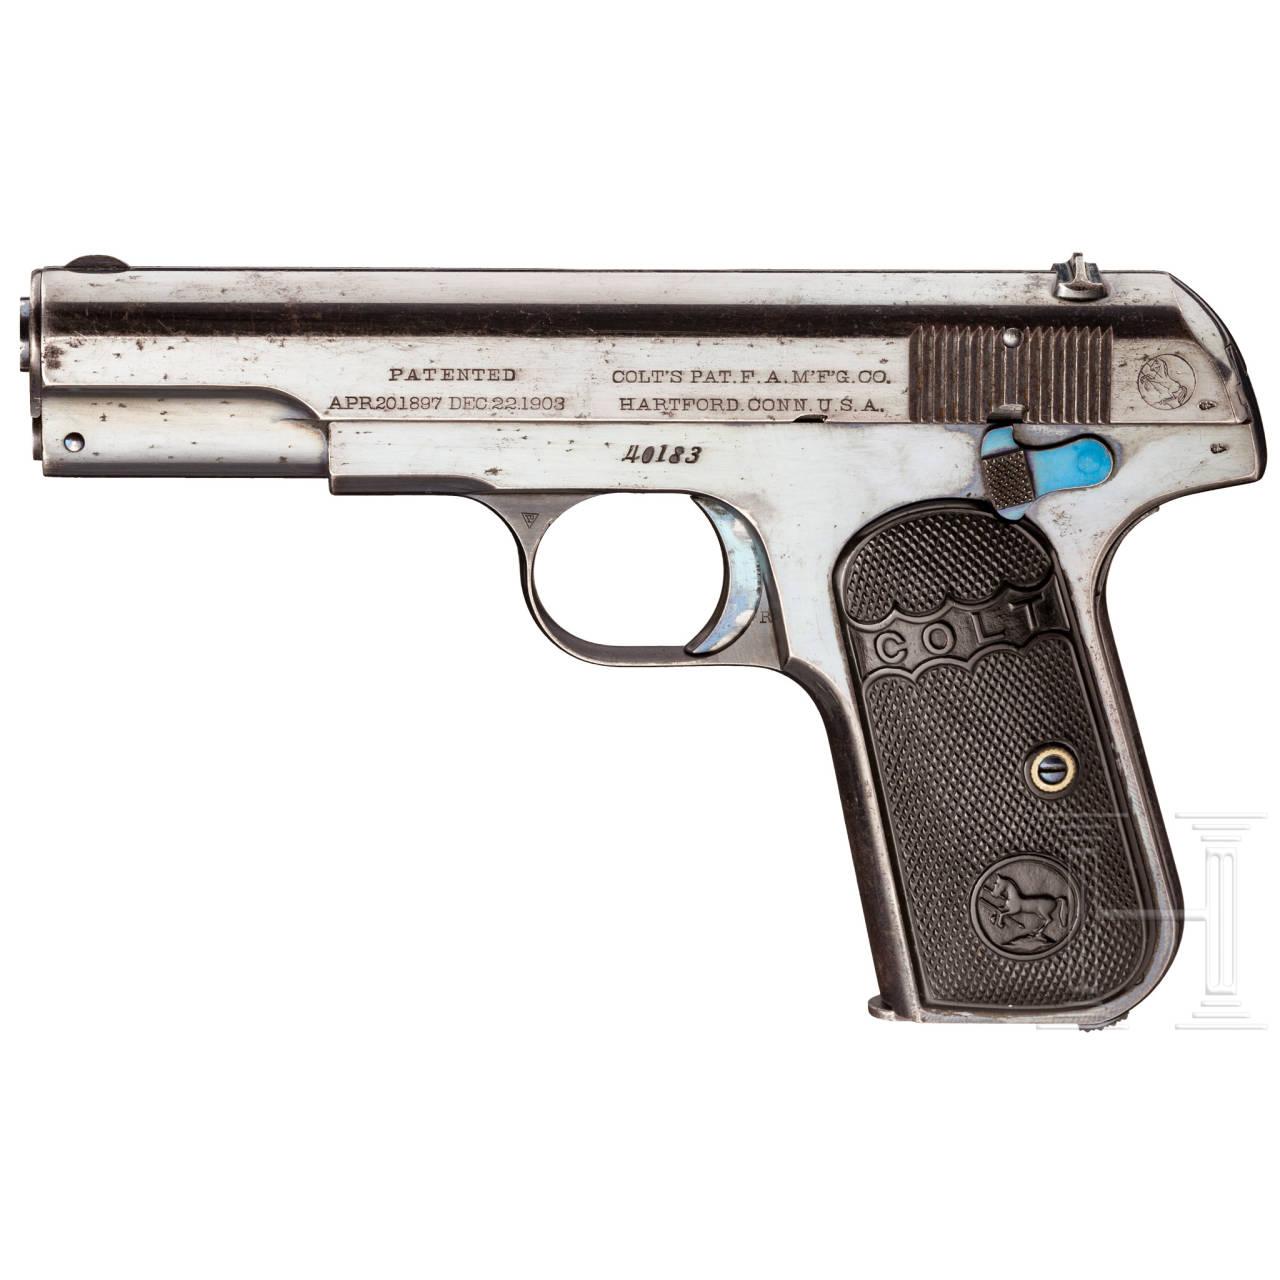 Colt Mod. 1903 Hammerless .32 Pocket